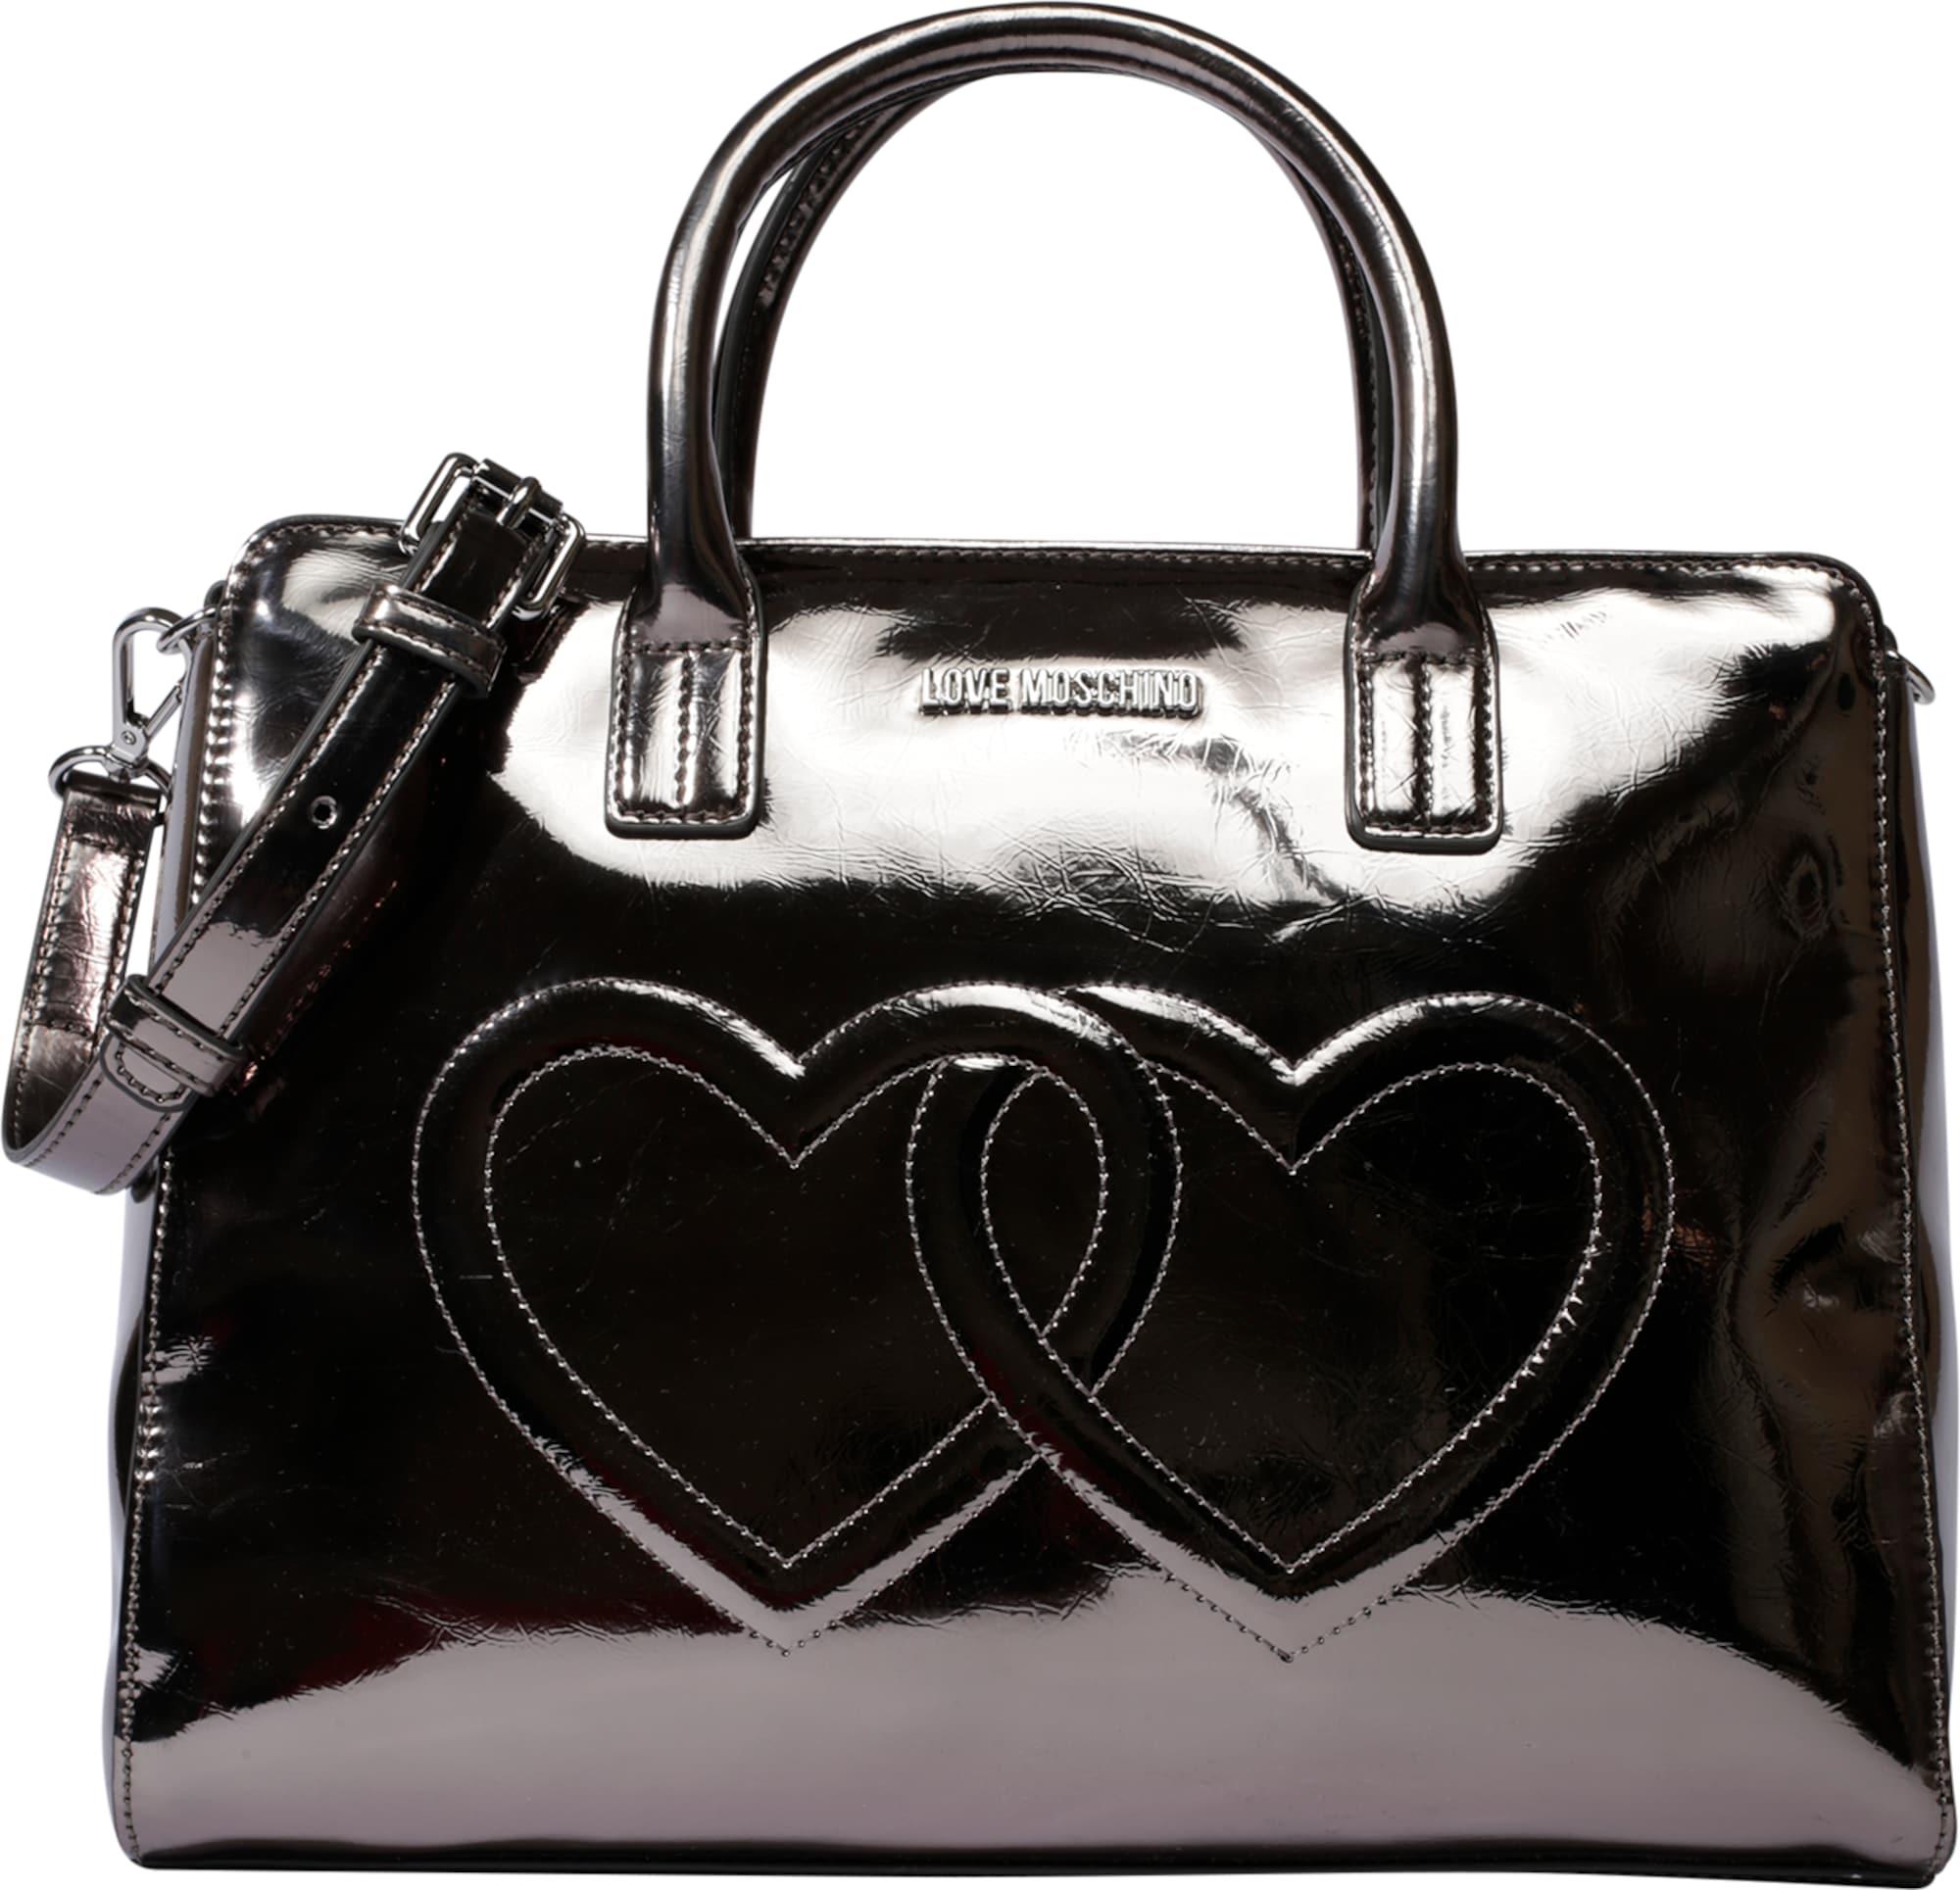 love moschino handtasche 39 embossed heart 39 in schwarz about you. Black Bedroom Furniture Sets. Home Design Ideas